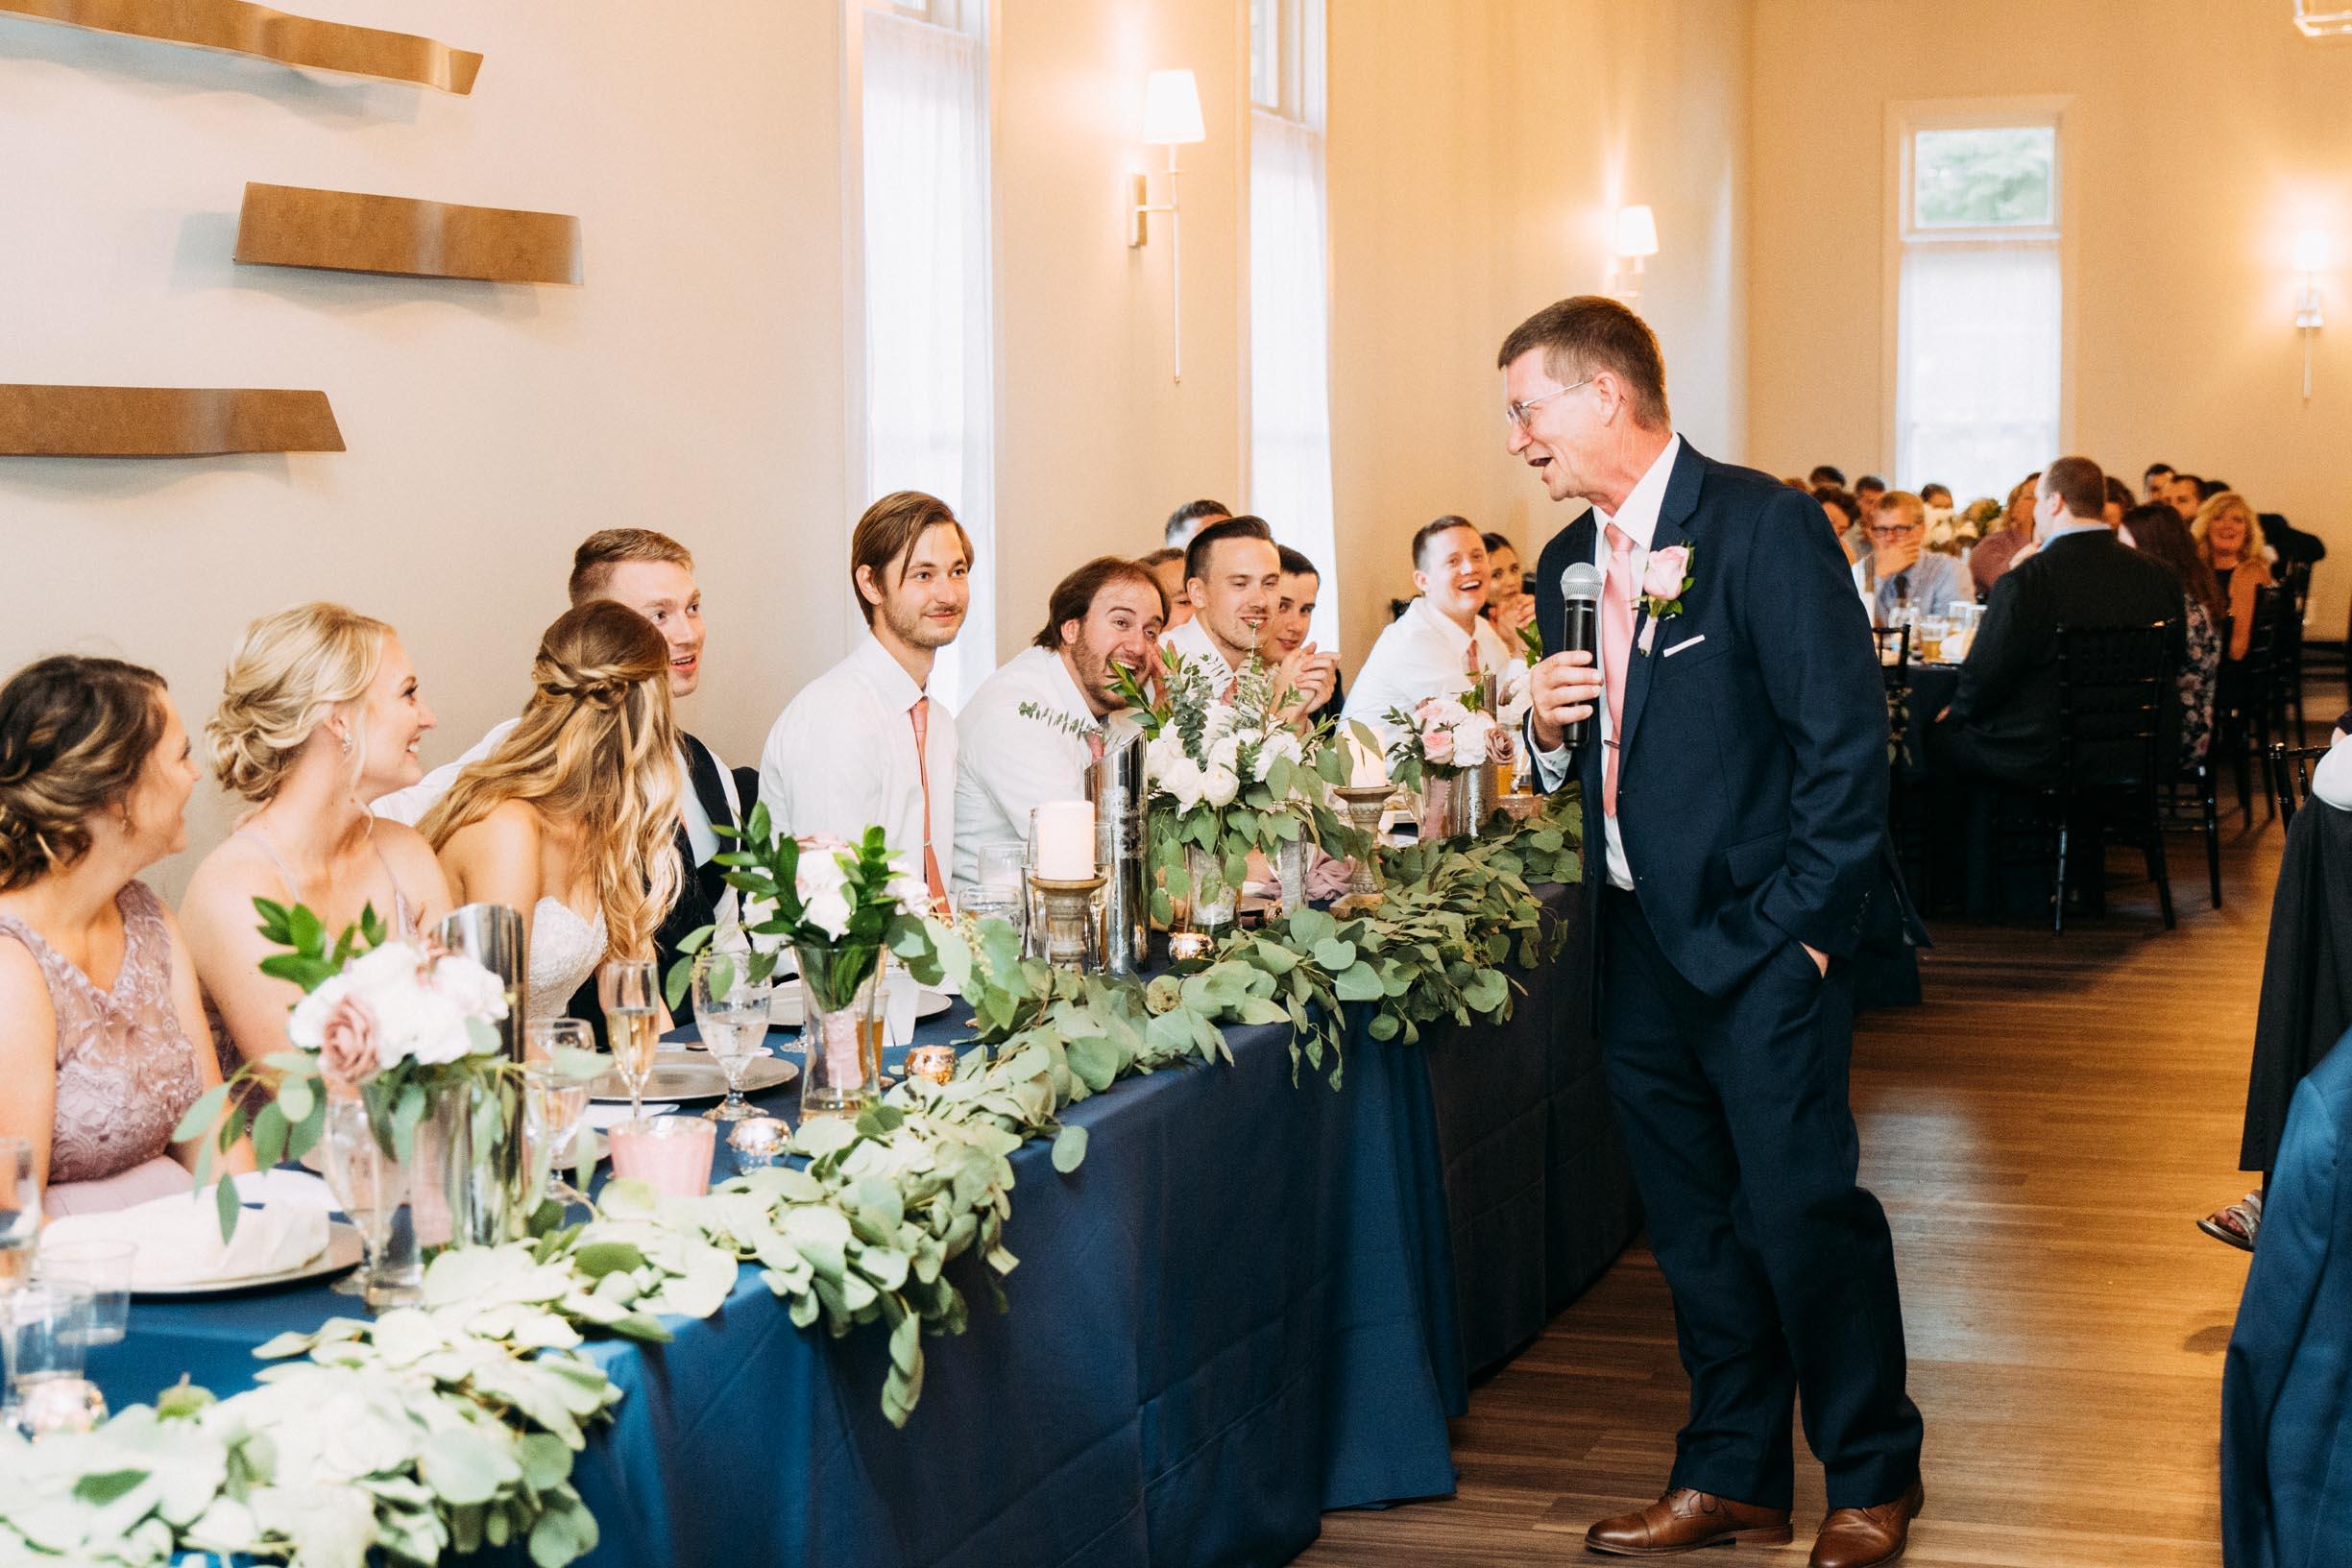 64-WeddingsattheBroz_Minnesota_WeddingBlog_Reception.jpg